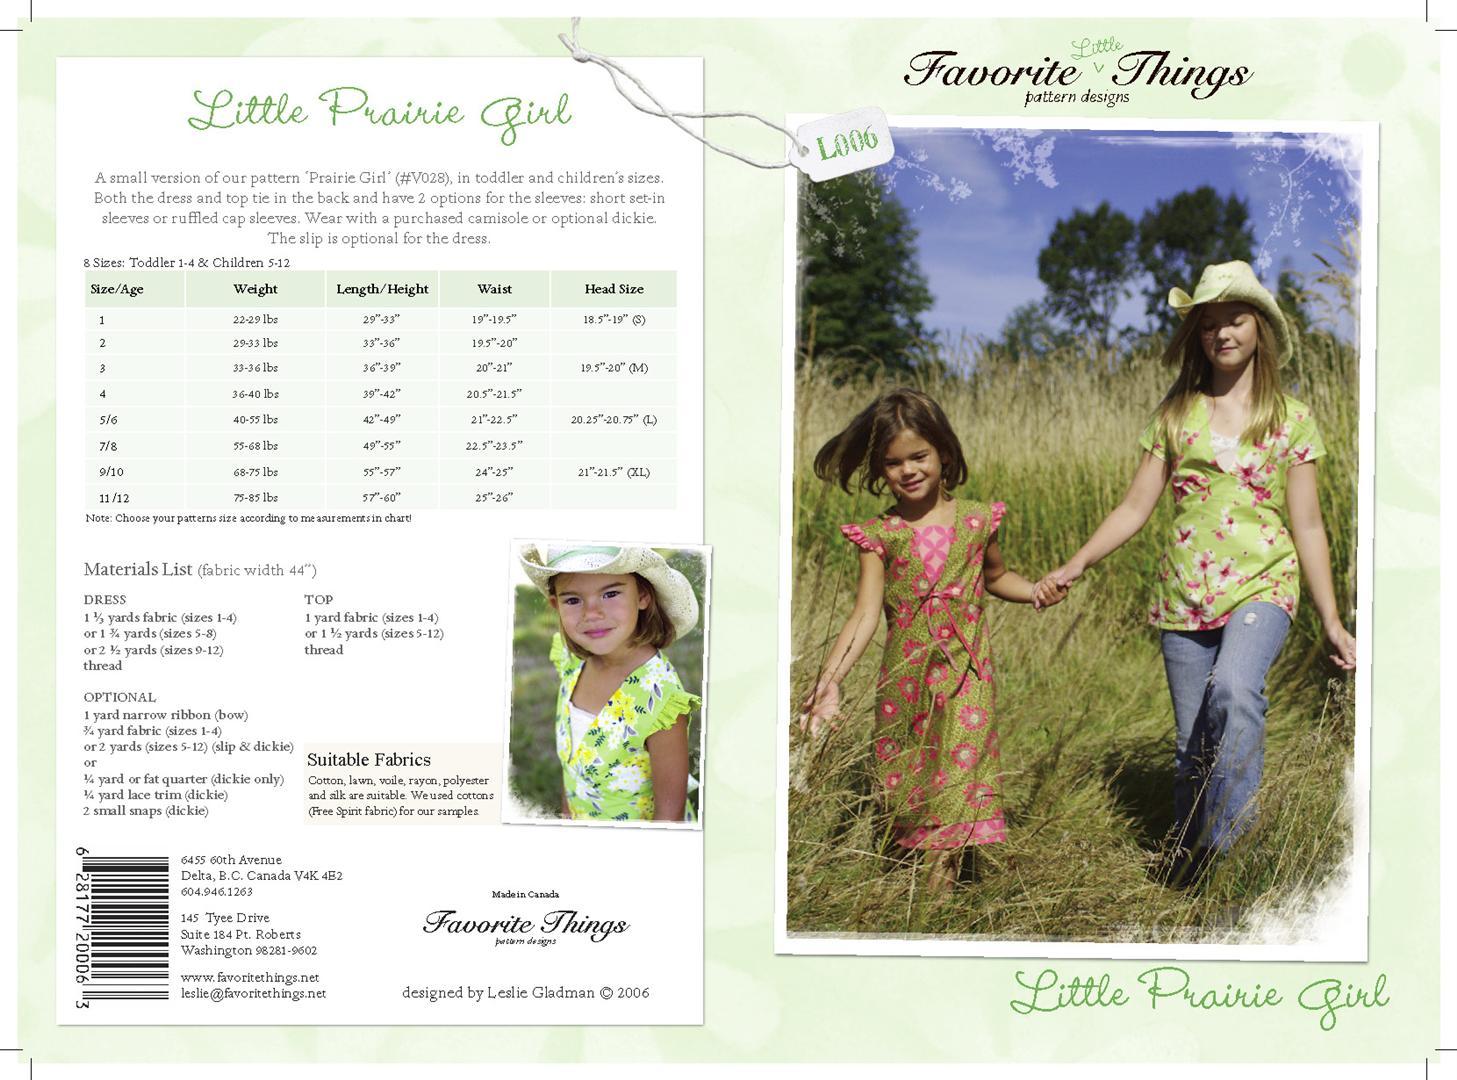 Favorite Things Little Prairie Girl L006